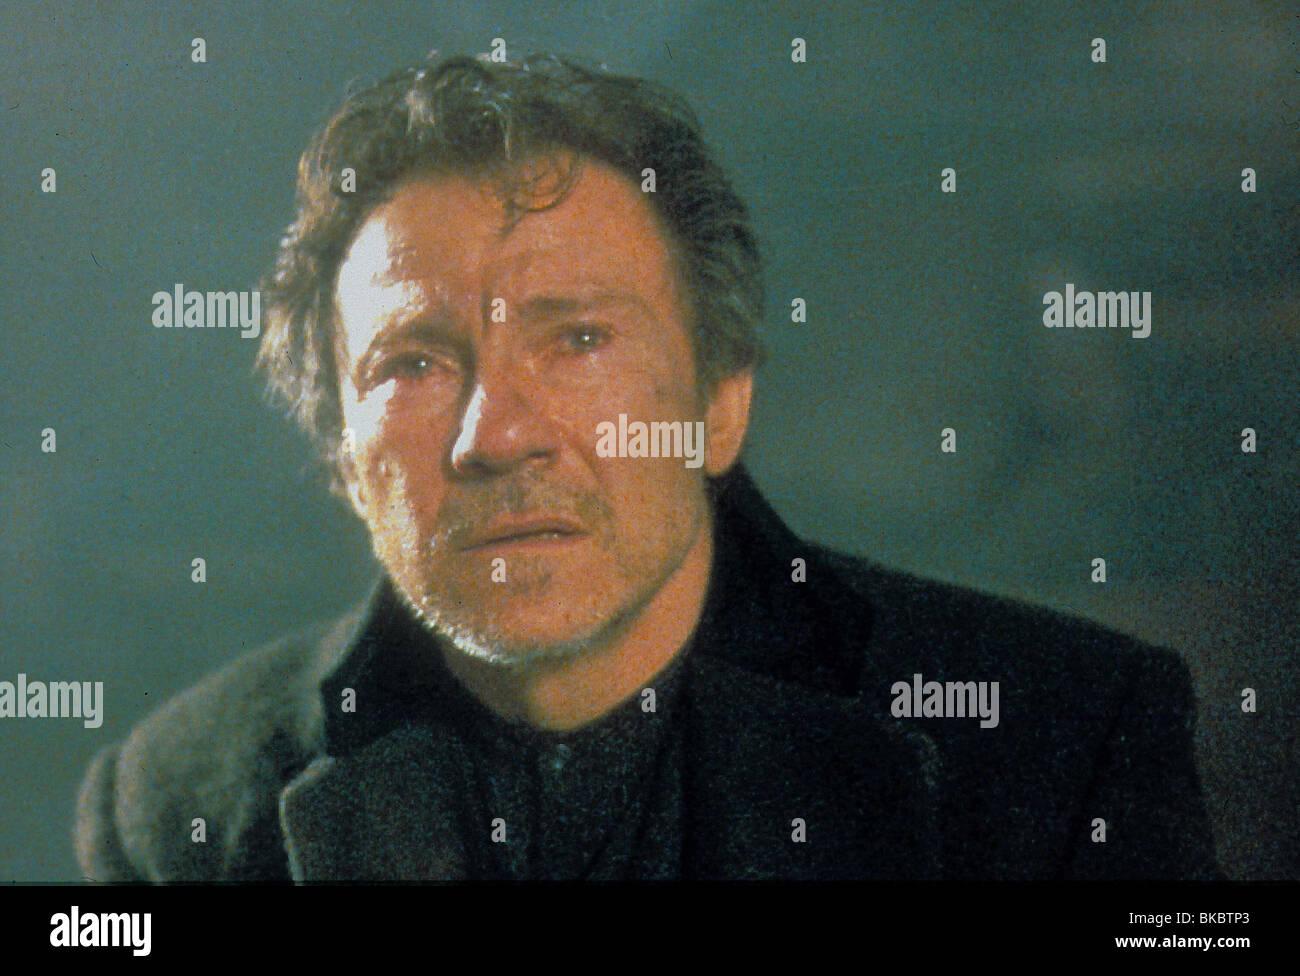 ULYSSES' GAZE (1996) HARVEY KEITEL UYSS 007 - Stock Image